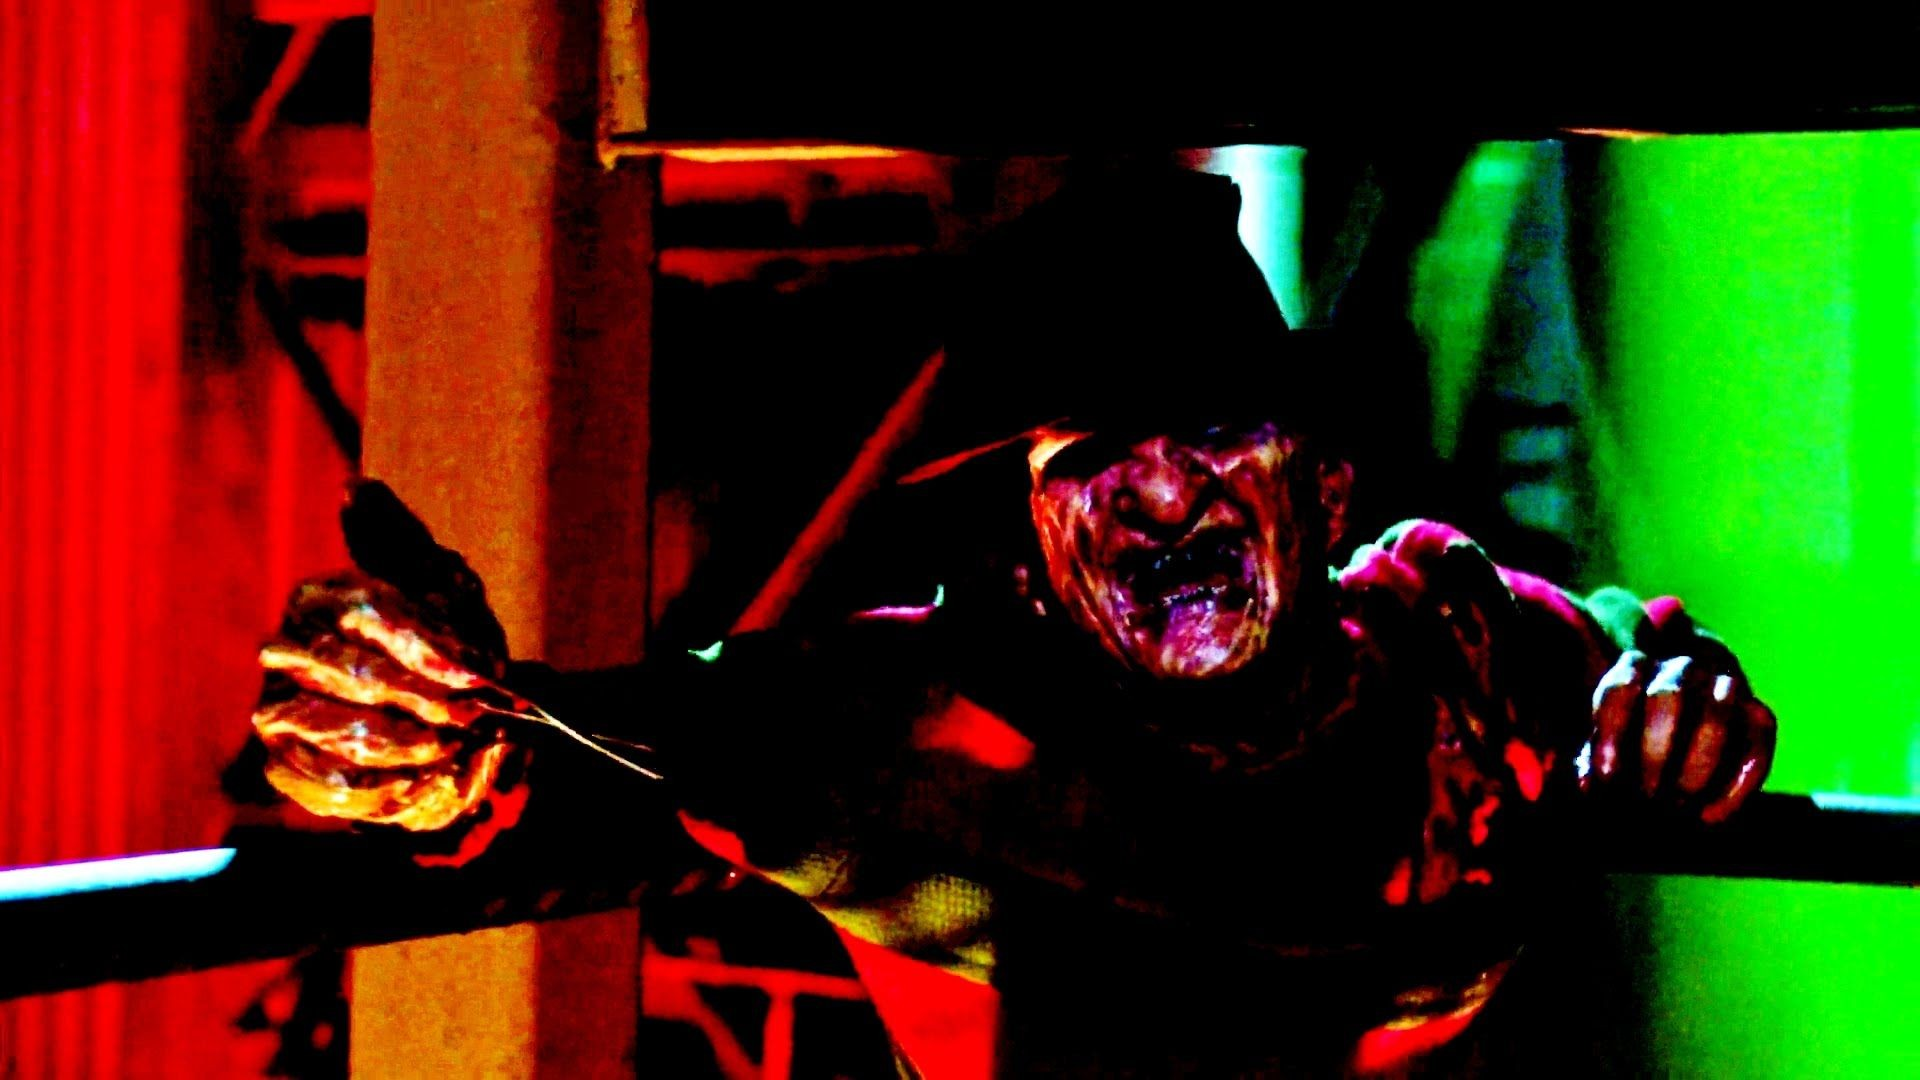 Jason Voorhees Mask Wallpaper Iphone Freddy Krueger Wallpaper 183 ① Download Free Amazing Hd